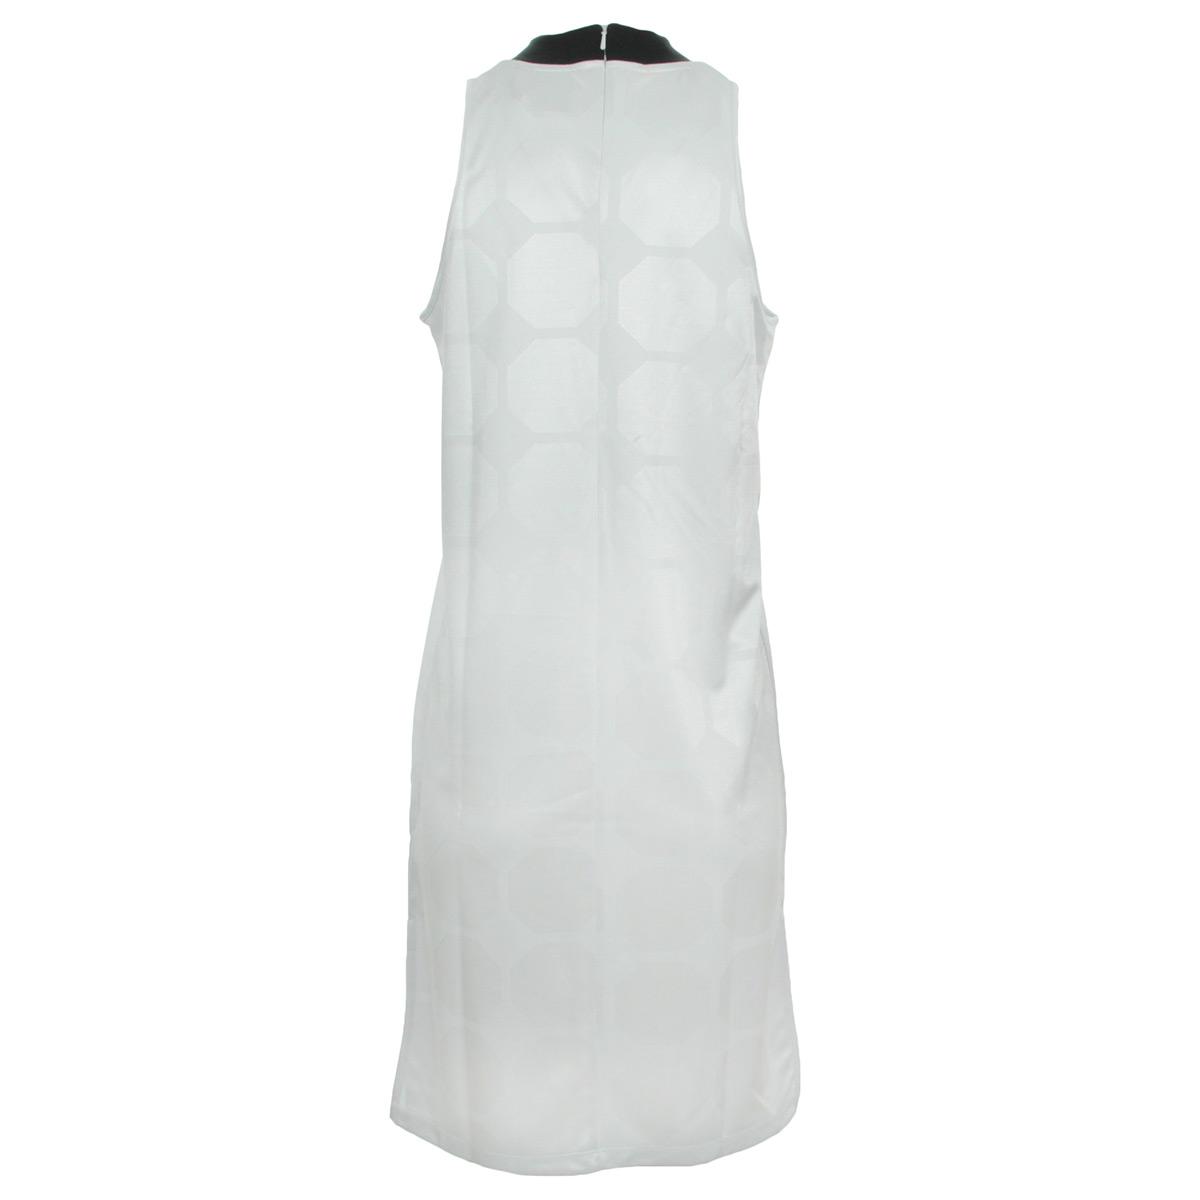 adidas Fashion League Dress CE3722, Robes femme